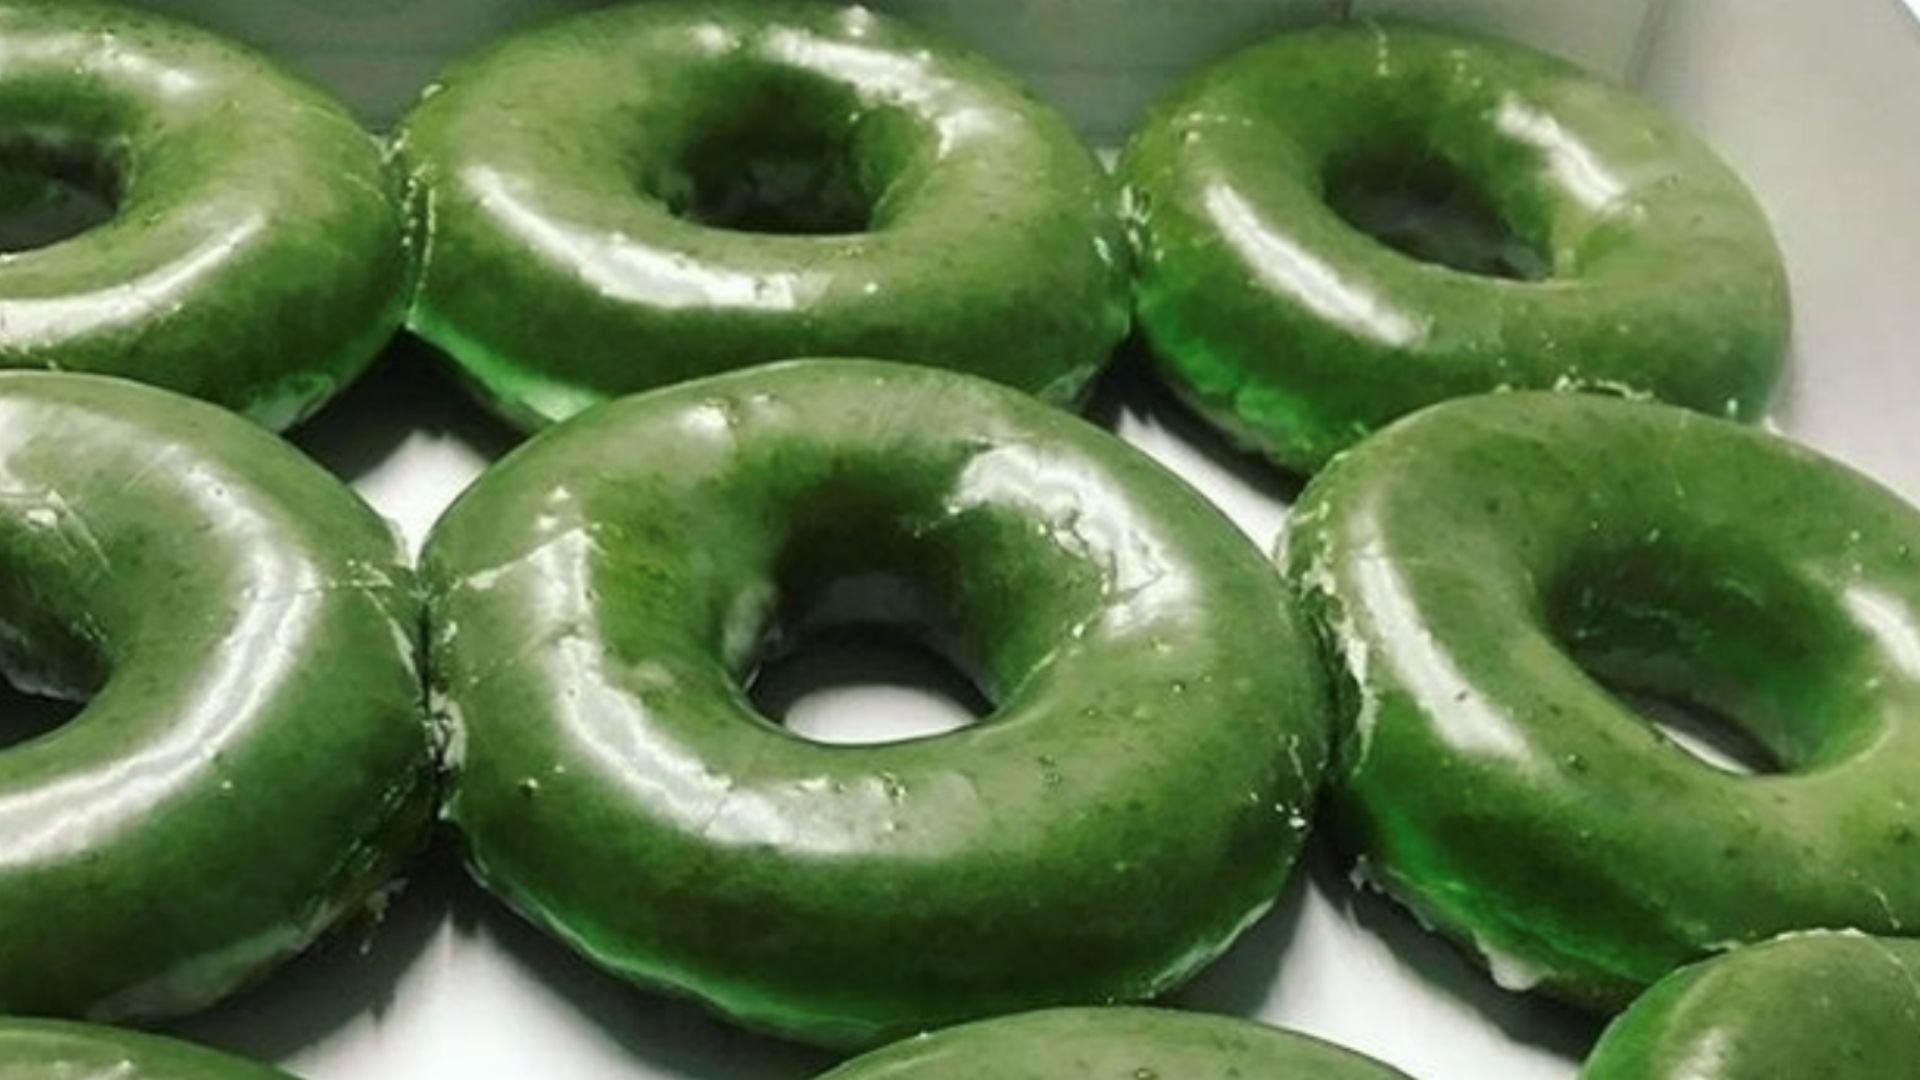 Krispy Kreme's Green Donuts & 3 More Stories Trending Now